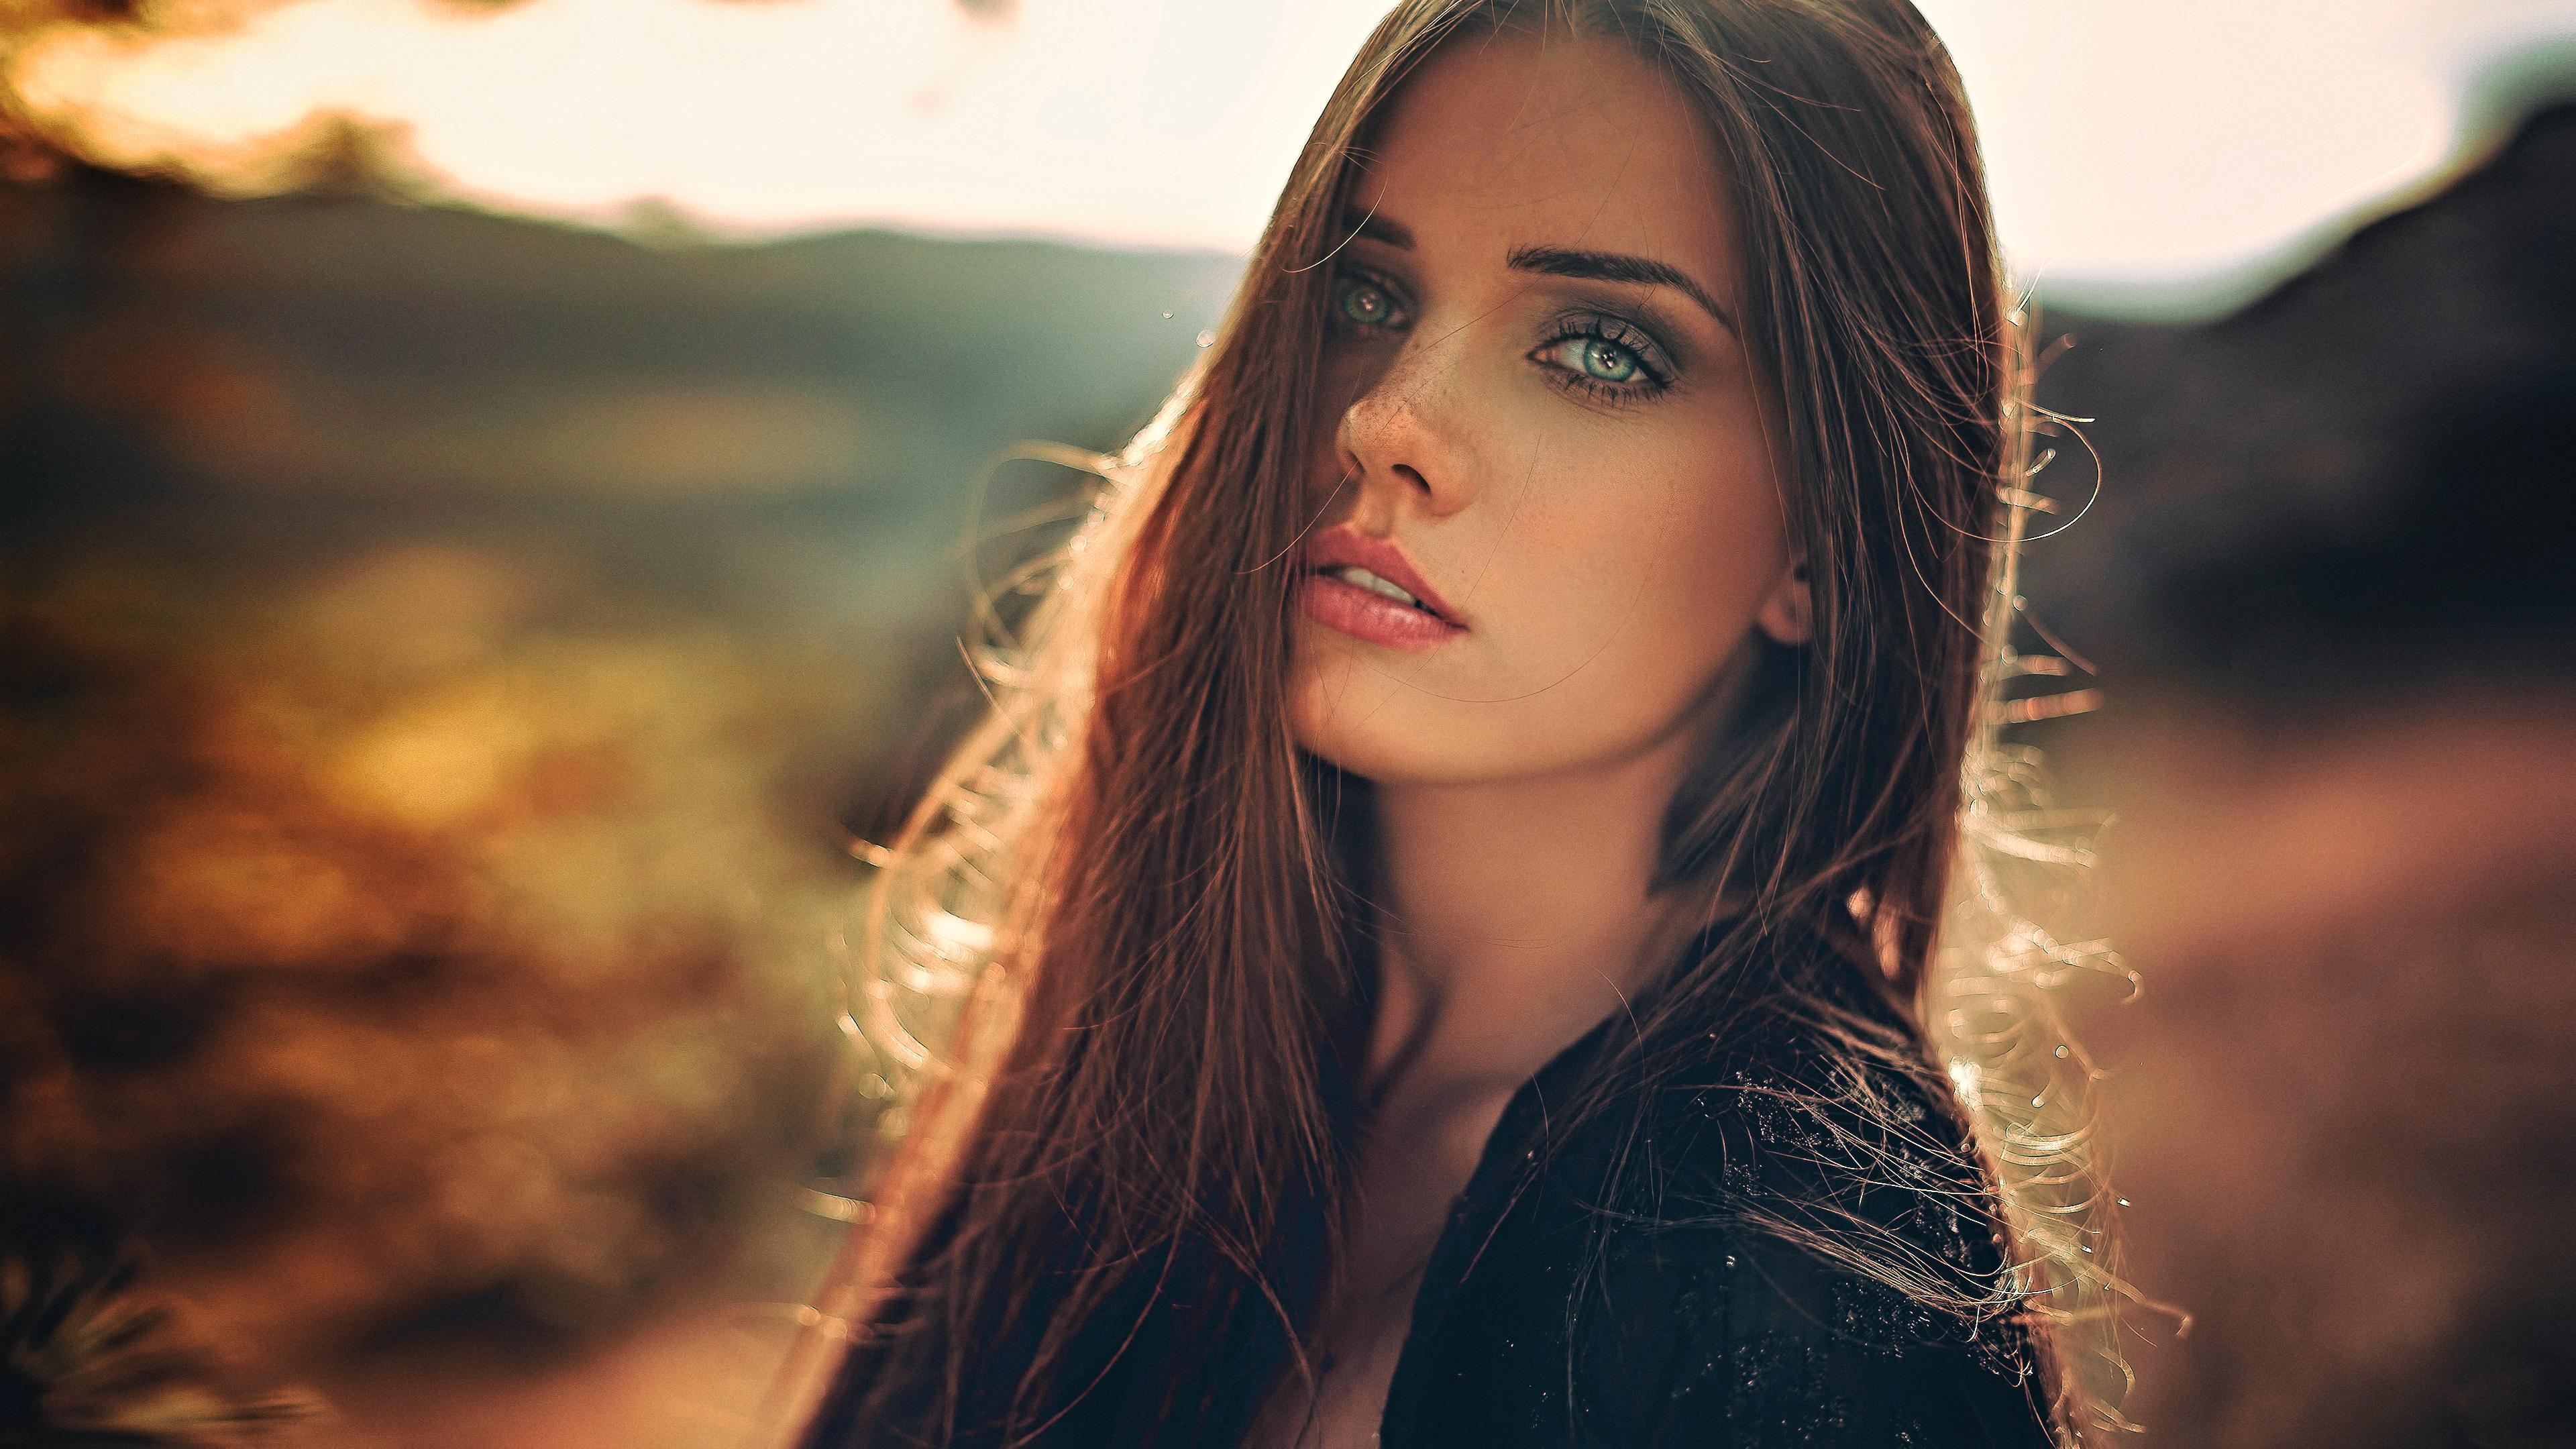 People 3840x2160 looking at viewer model portrait women photography face sunlight depth of field brunette pink lipstick